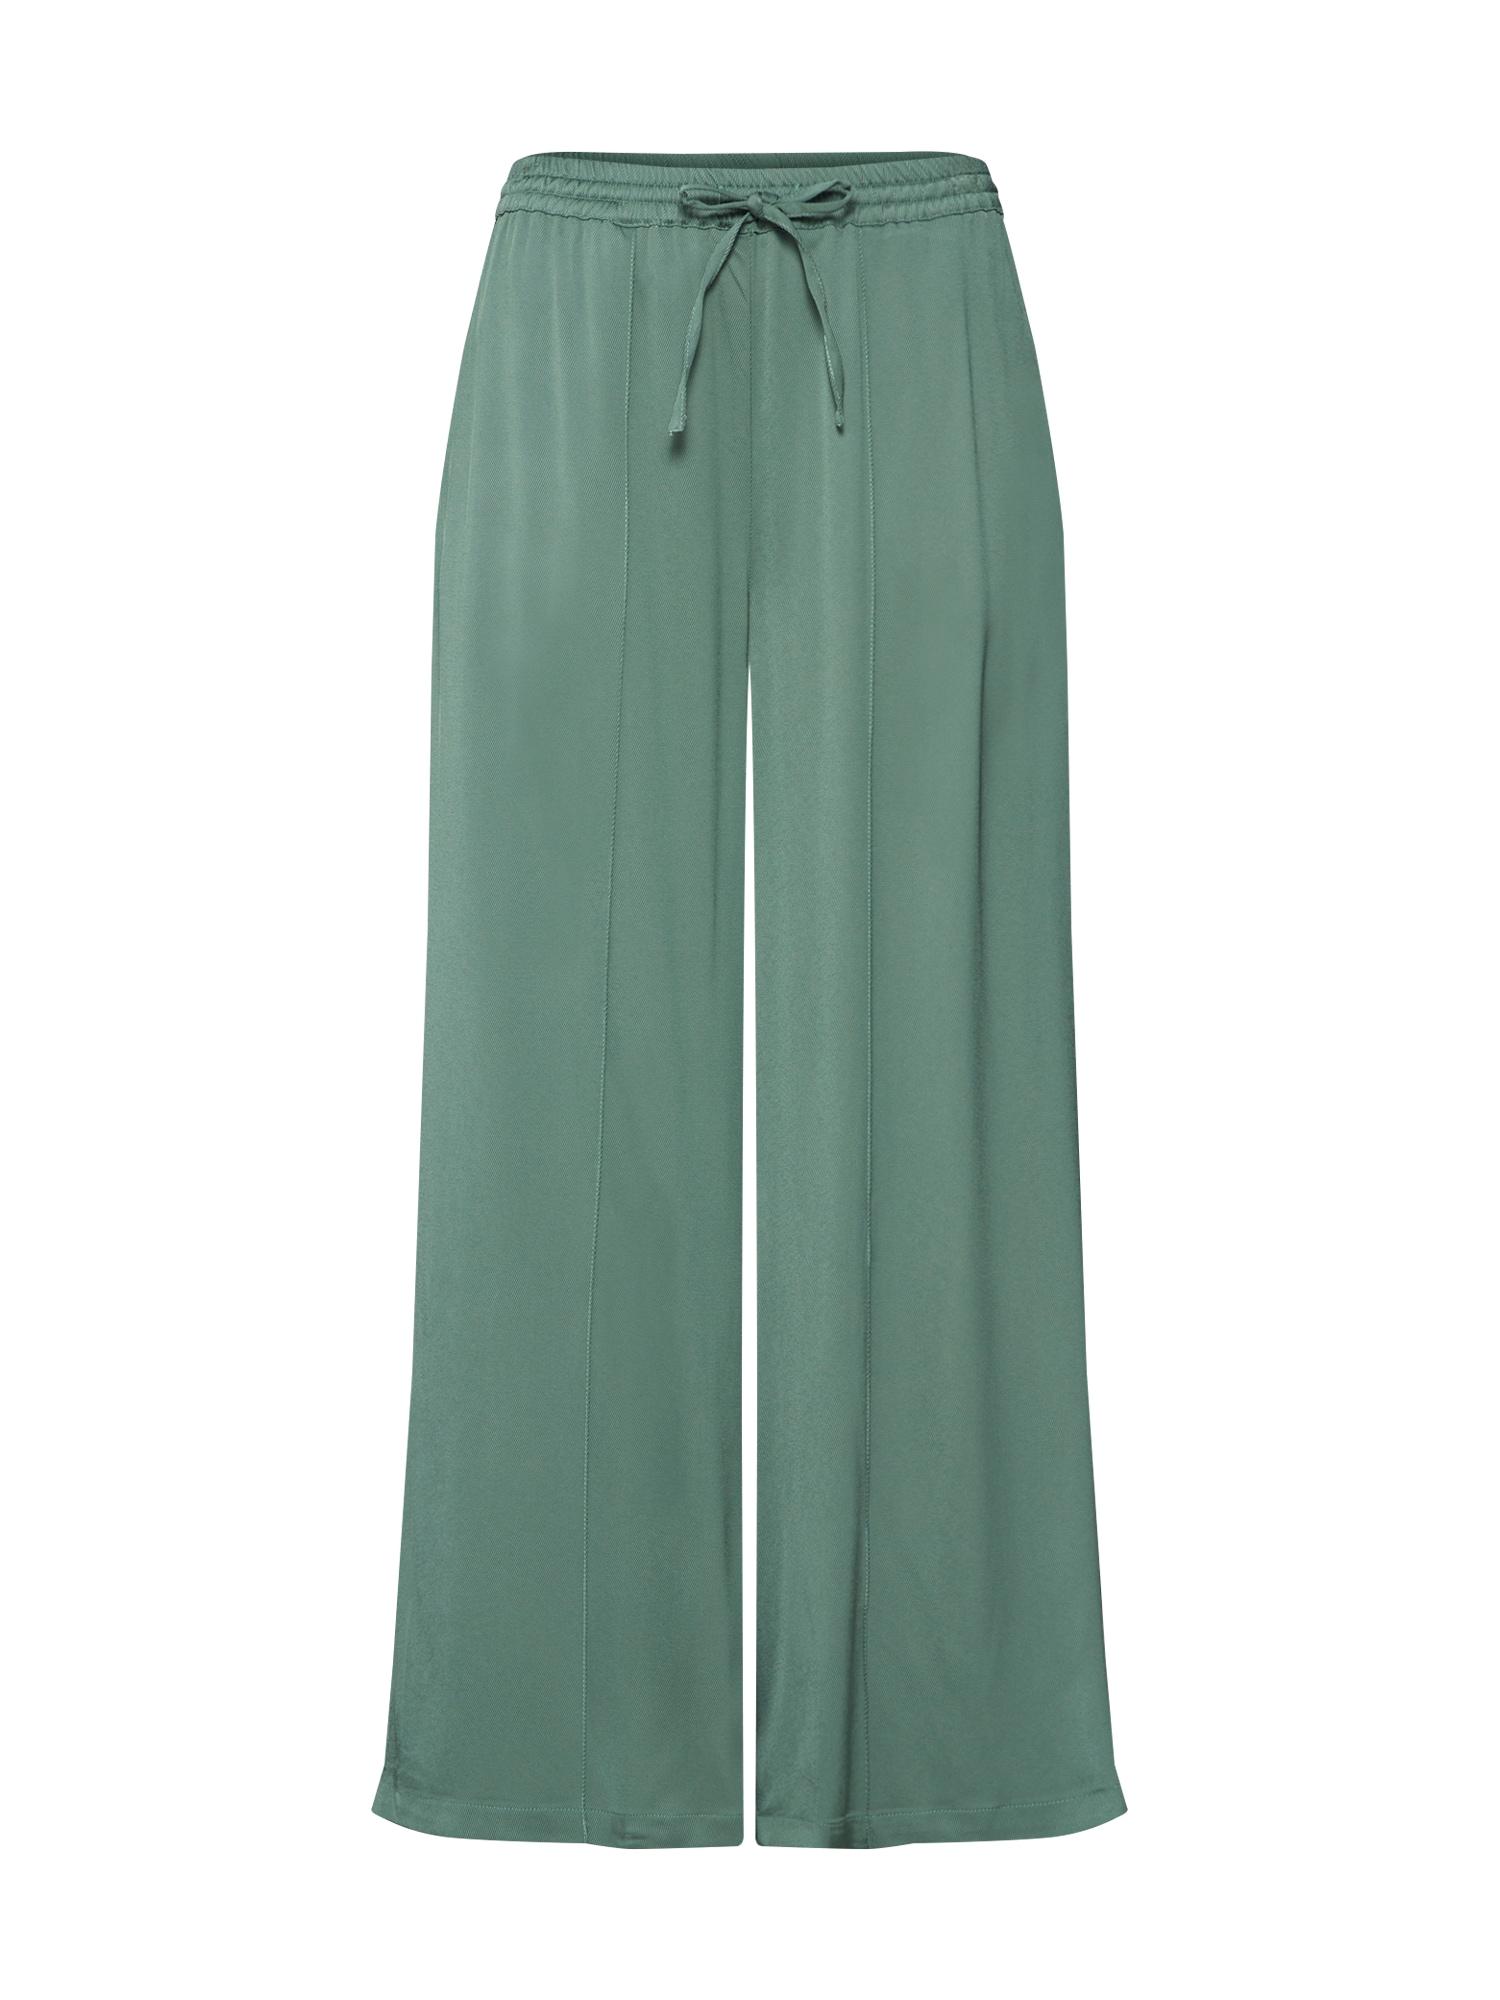 Kalhoty Icoday nefritová AMERICAN VINTAGE